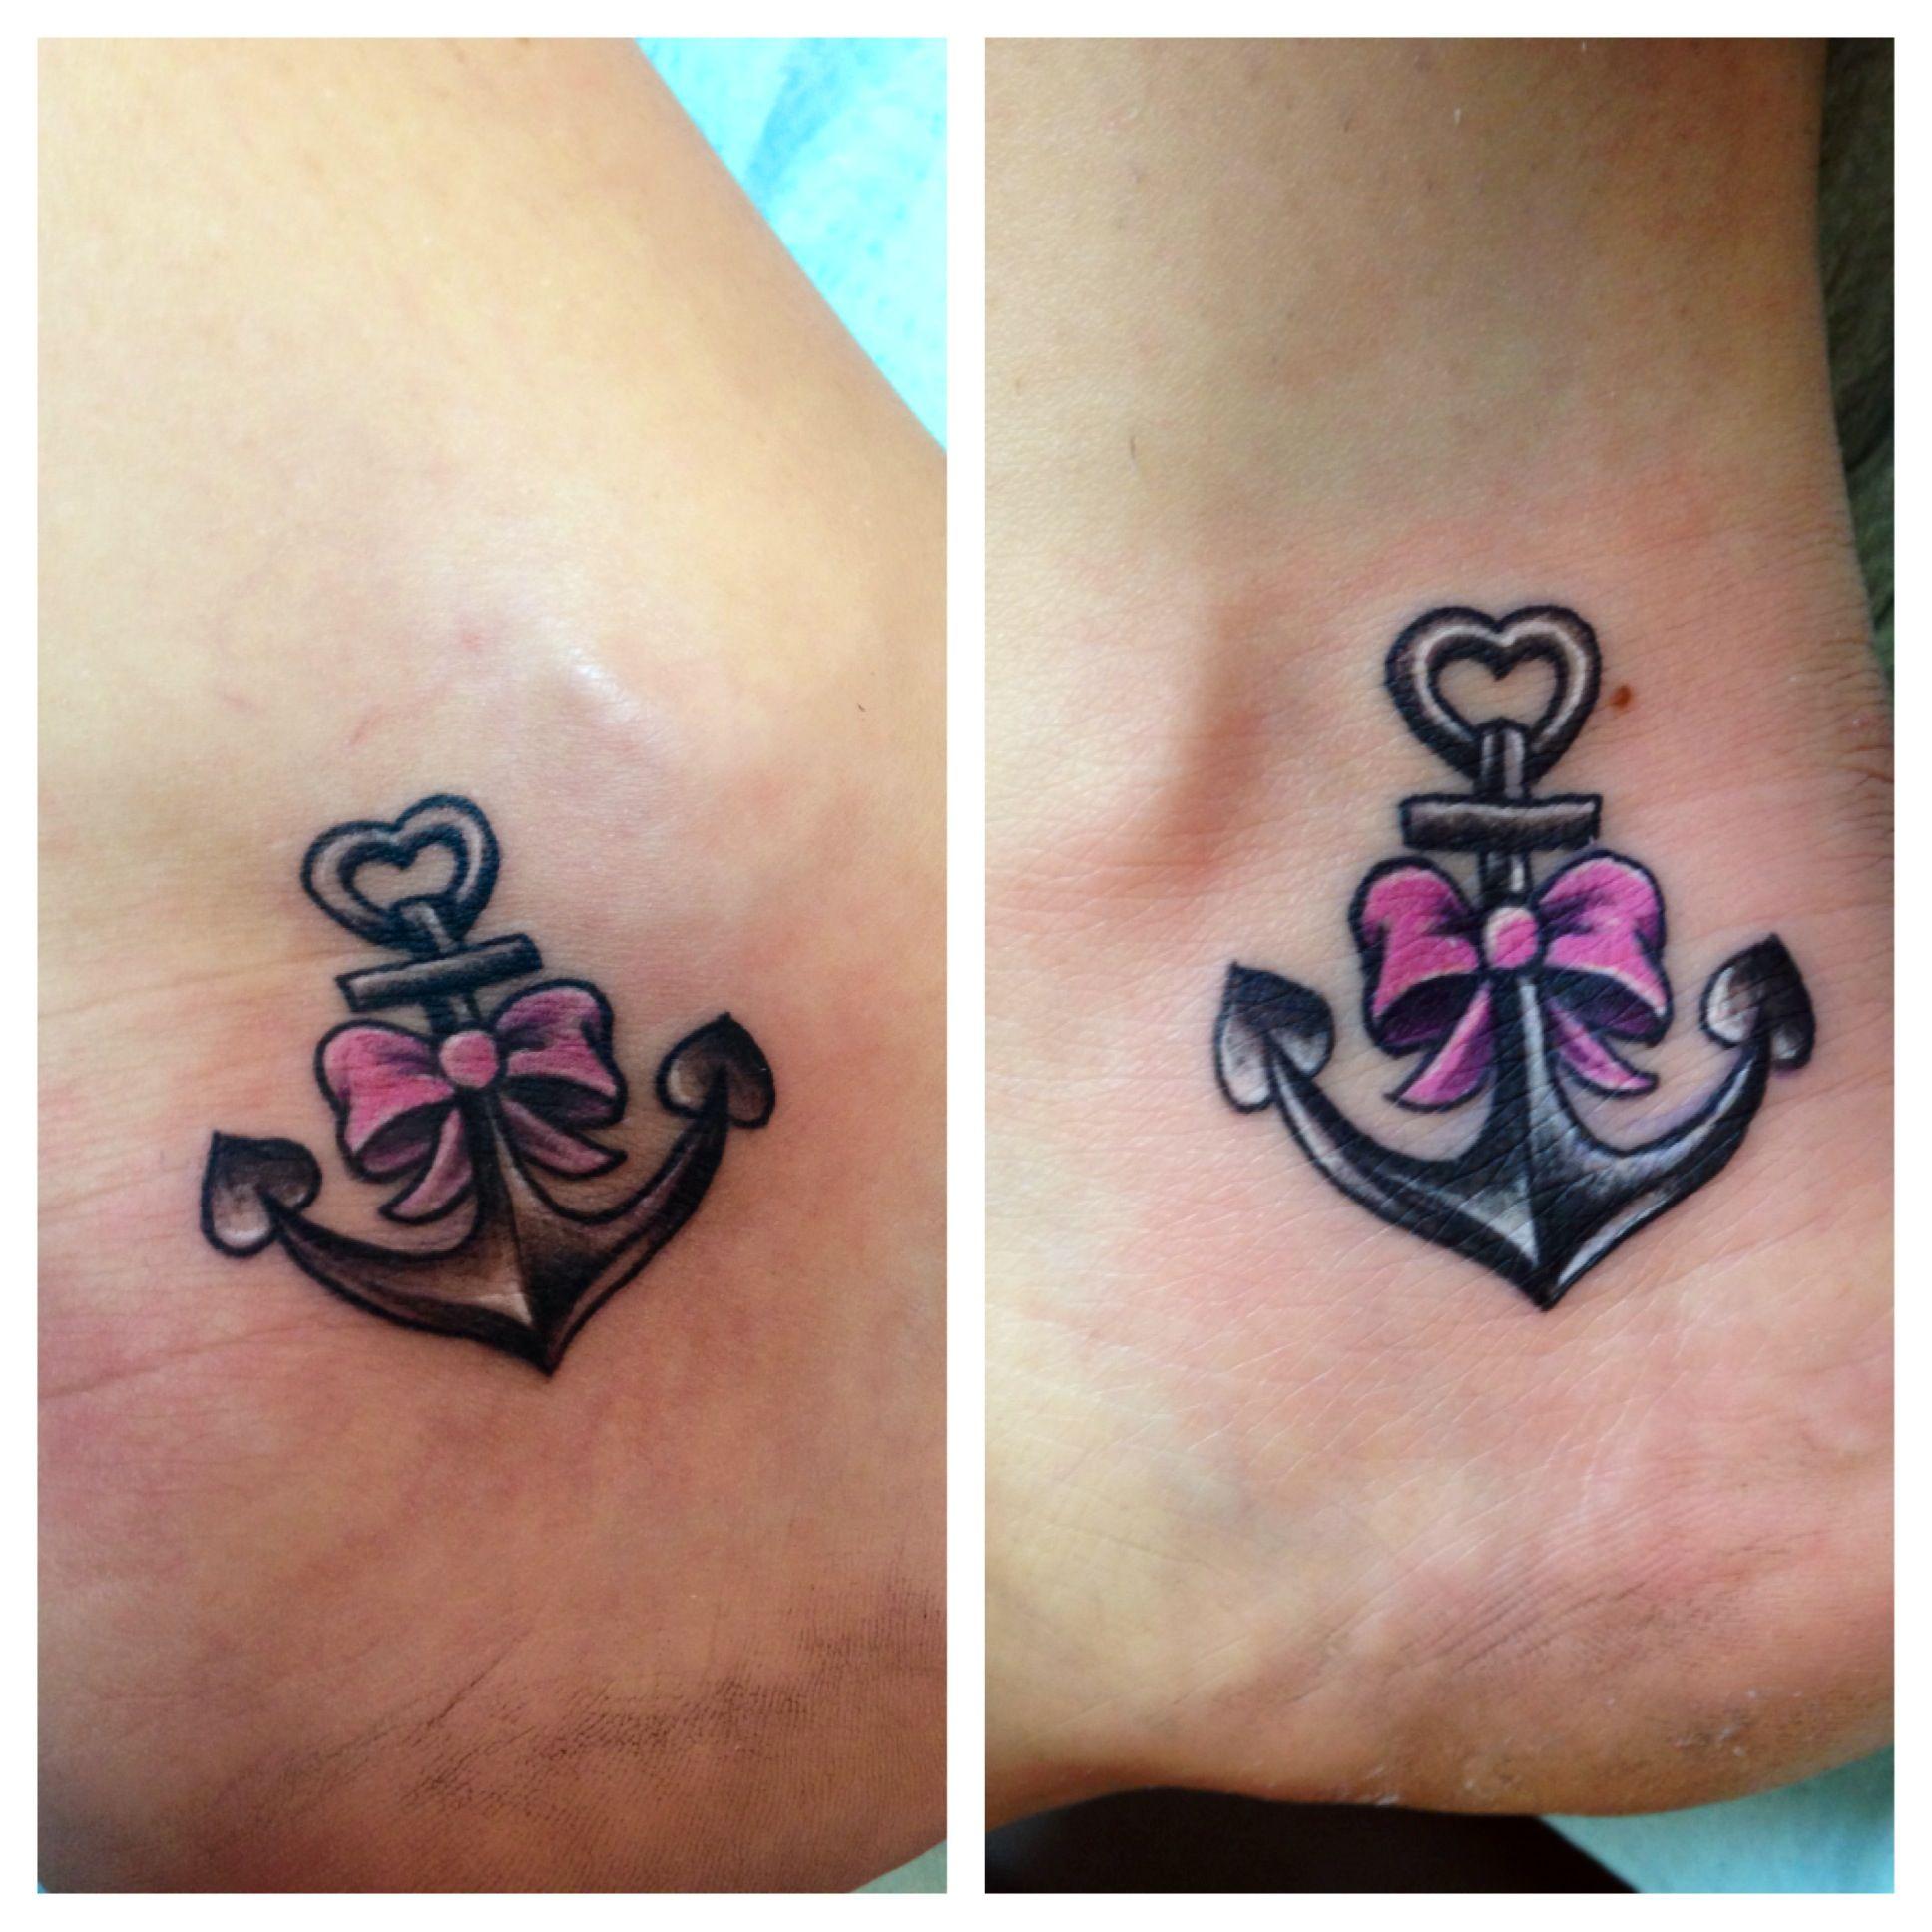 40 fantastic friendship tattoos creativefan - 40 Creative Best Friend Tattoos